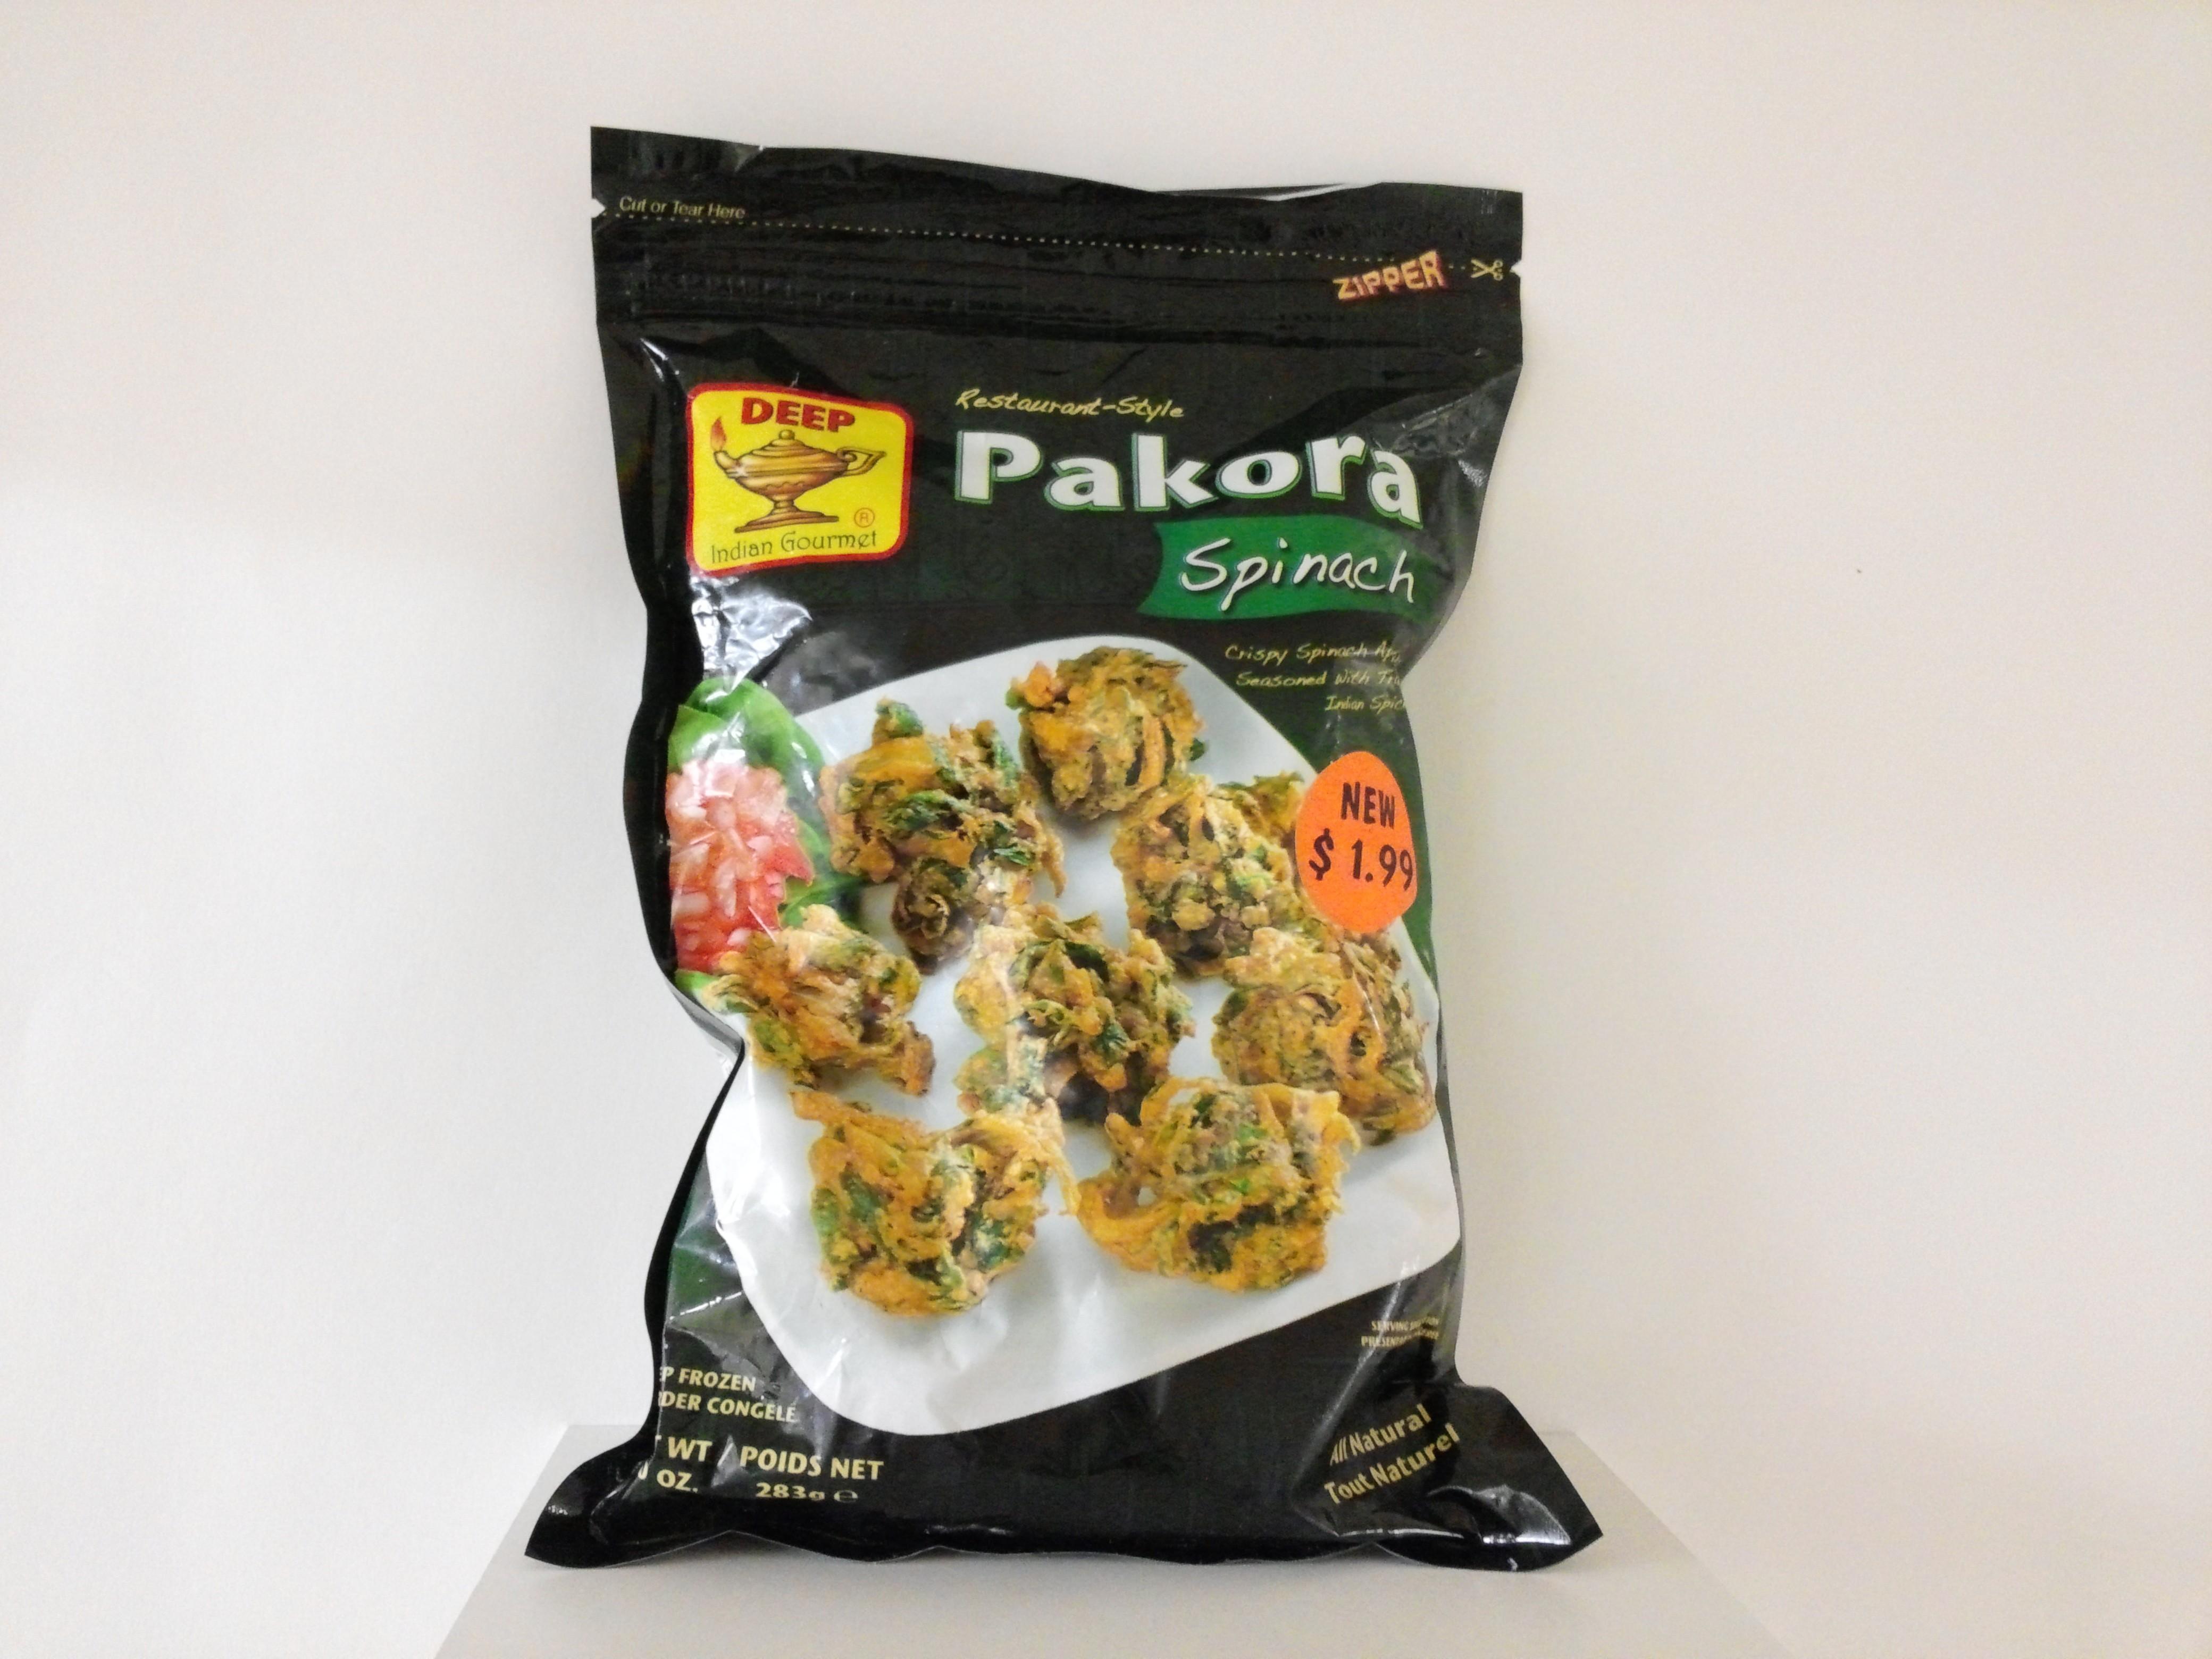 Deep Pakora Spinach 10 oz